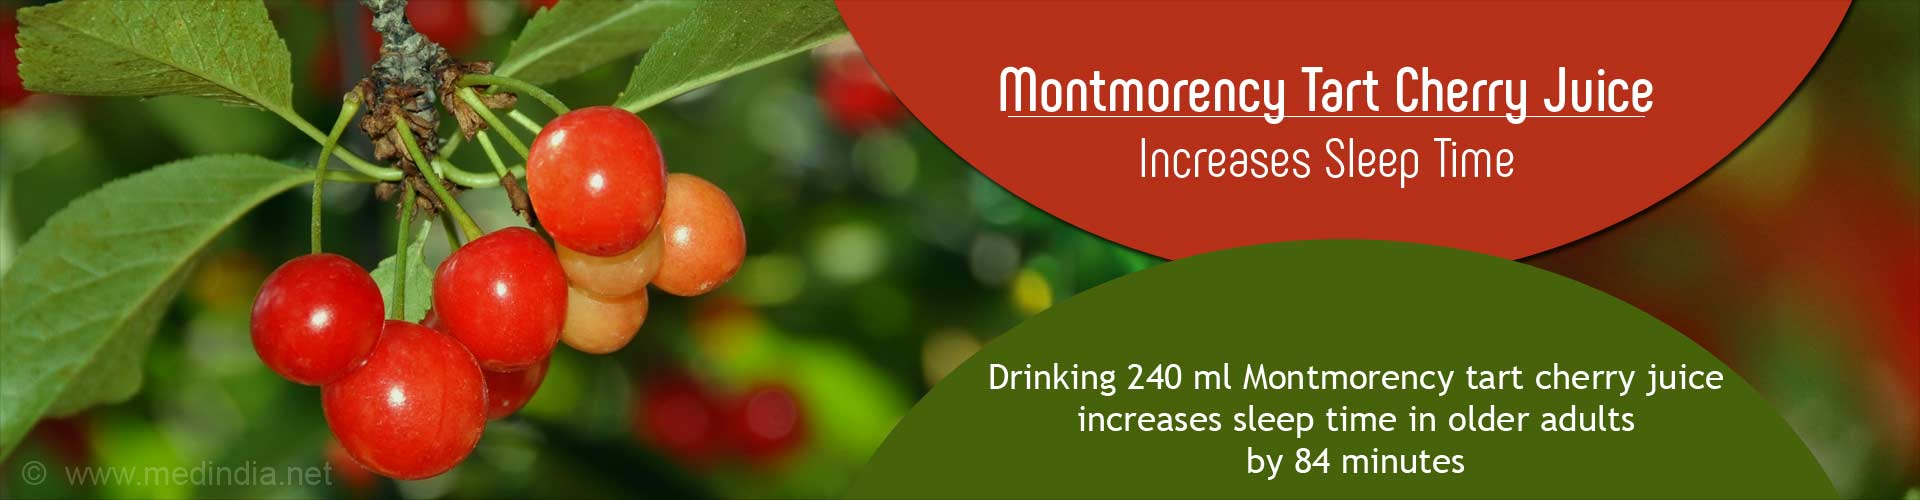 Drinking Cherry Juice Can Increase Sleep Time in Elderly